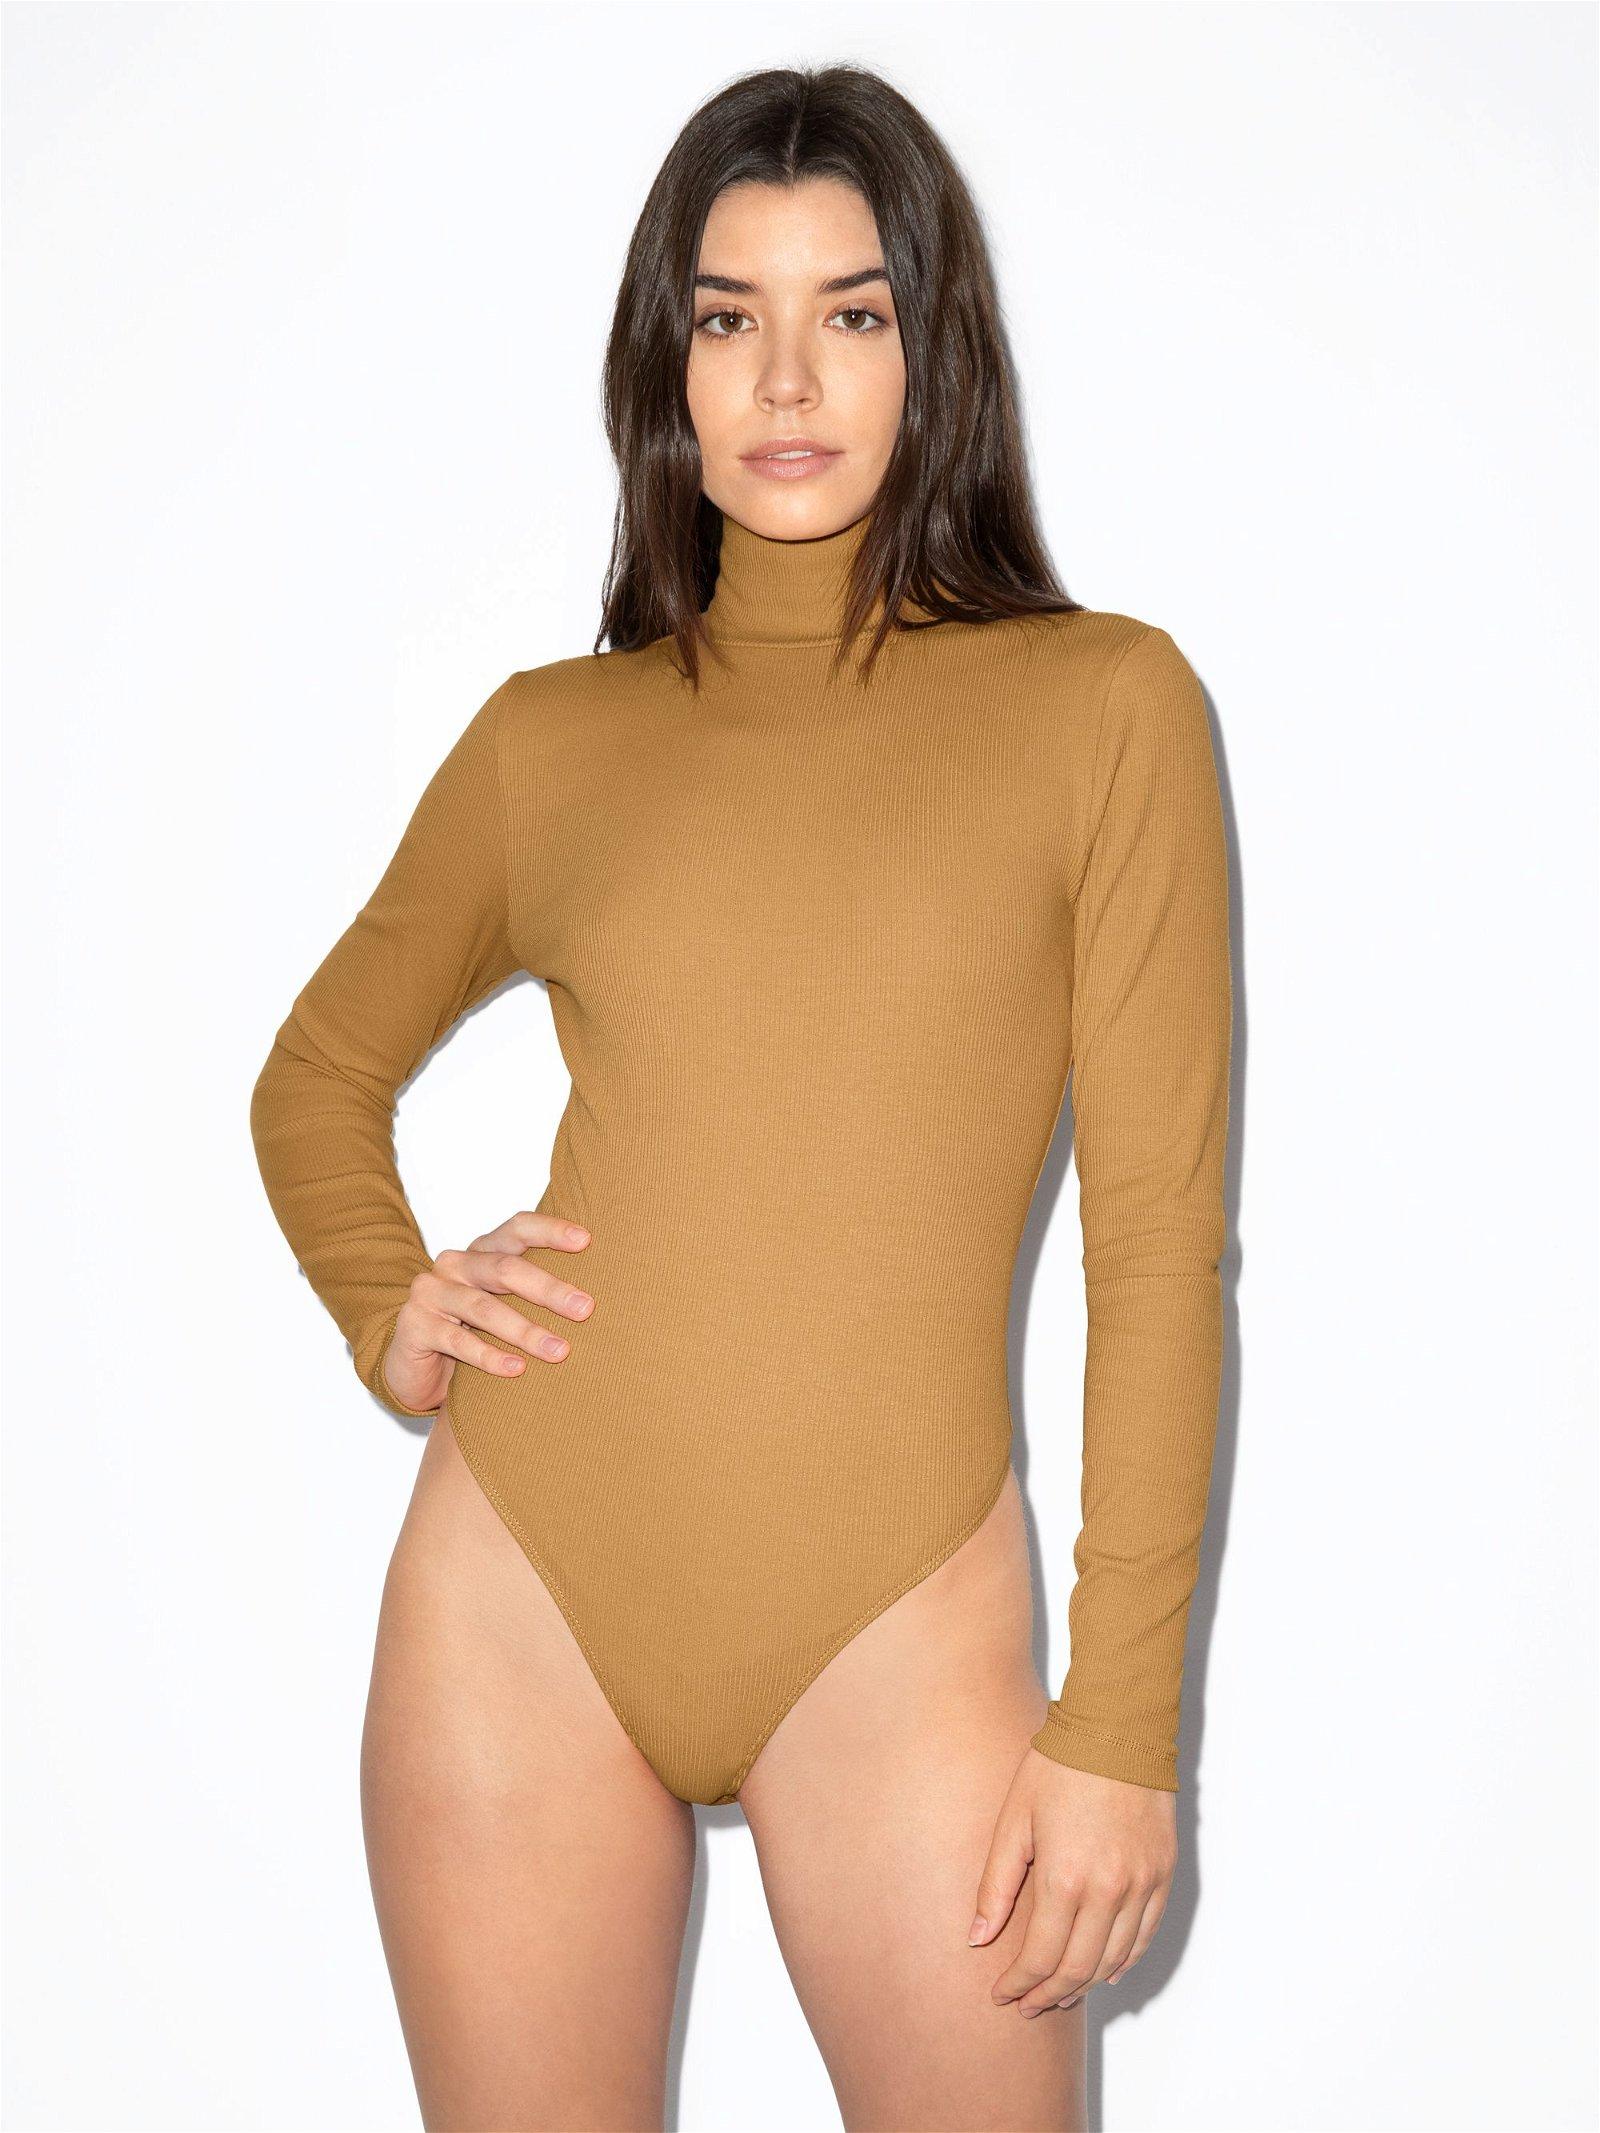 Women's Cotton 2x2 Turtleneck Long Sleeve Bodysuit in Honey Size X-Small by American Apparel